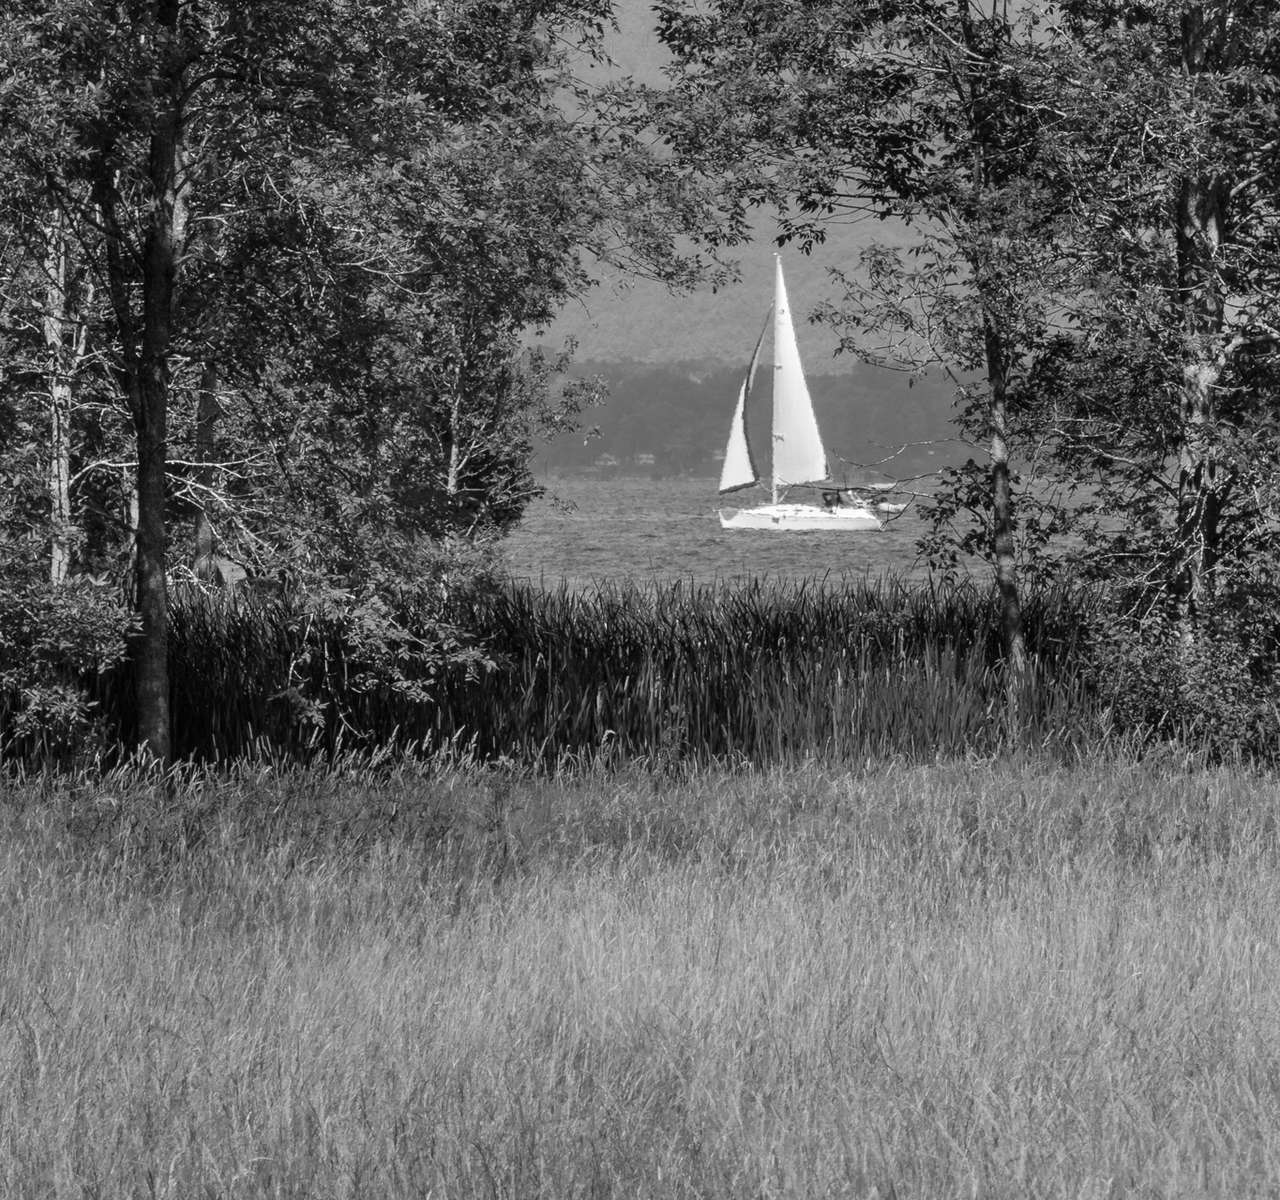 Sailing by Shelburne Farms 20